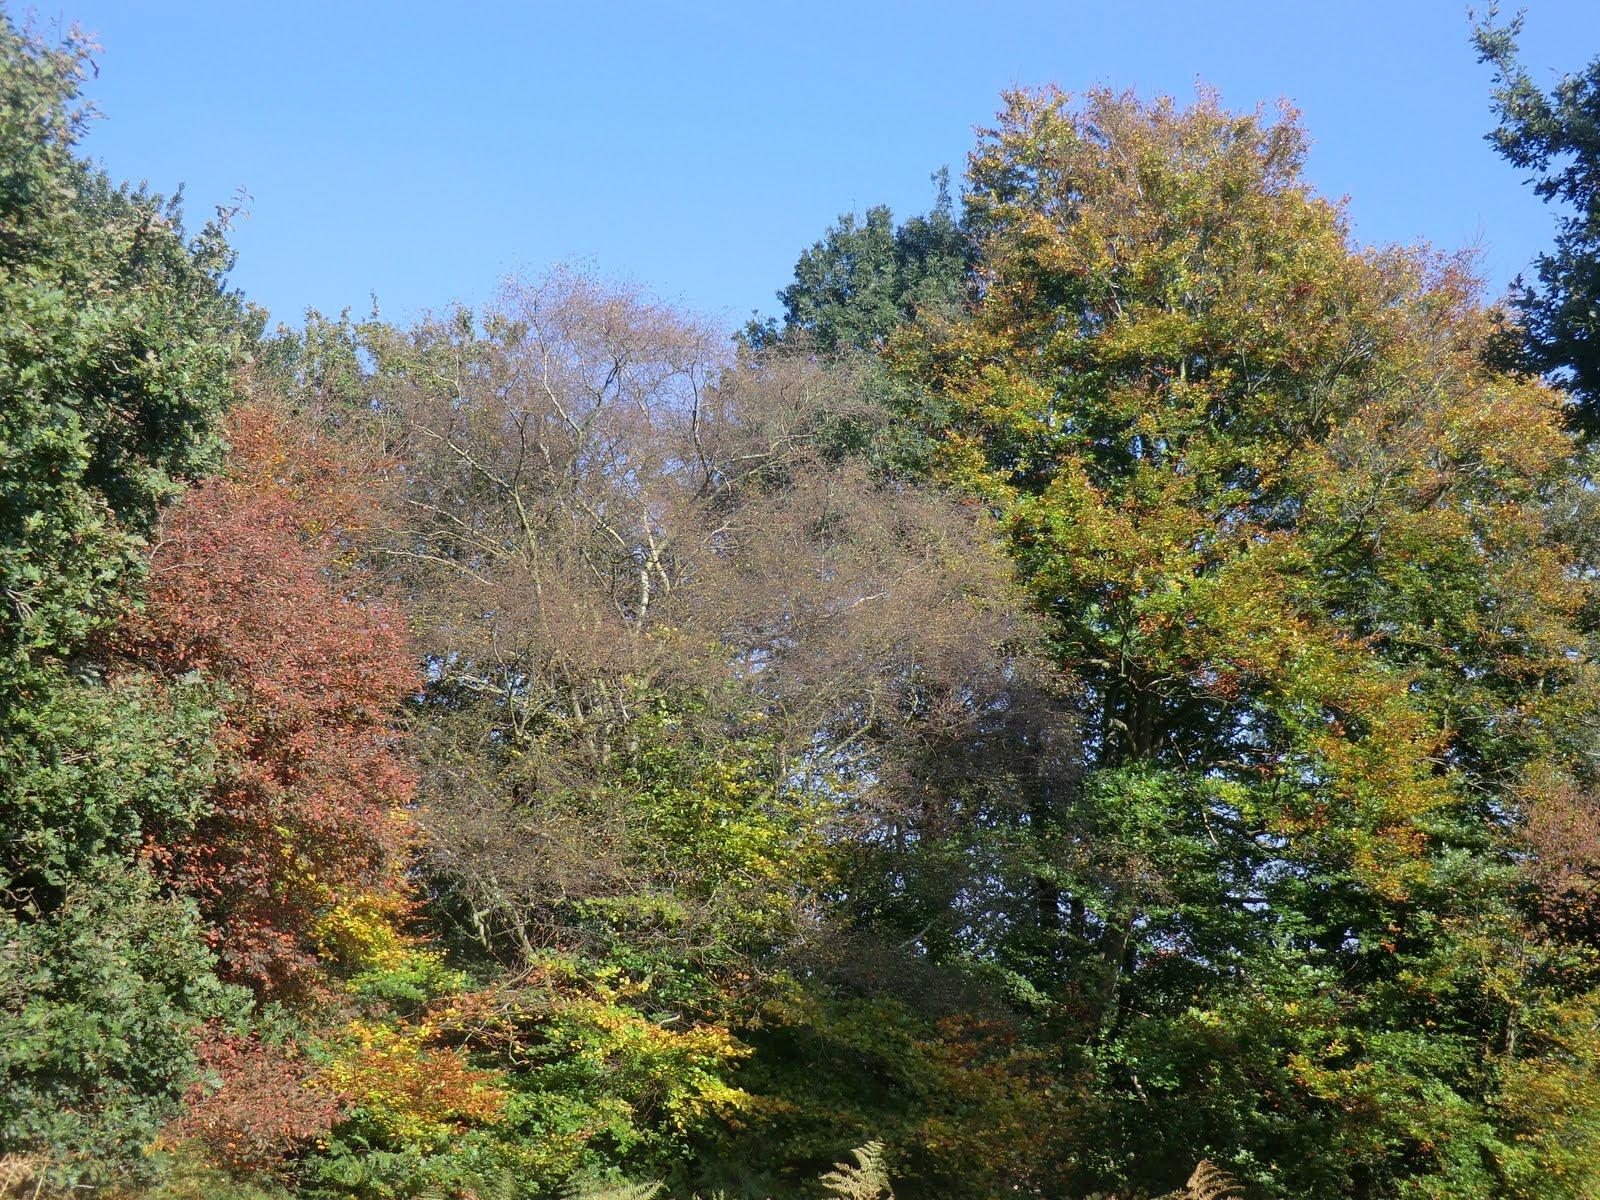 CIMG0844 Autumn colours on Ashdown Forest